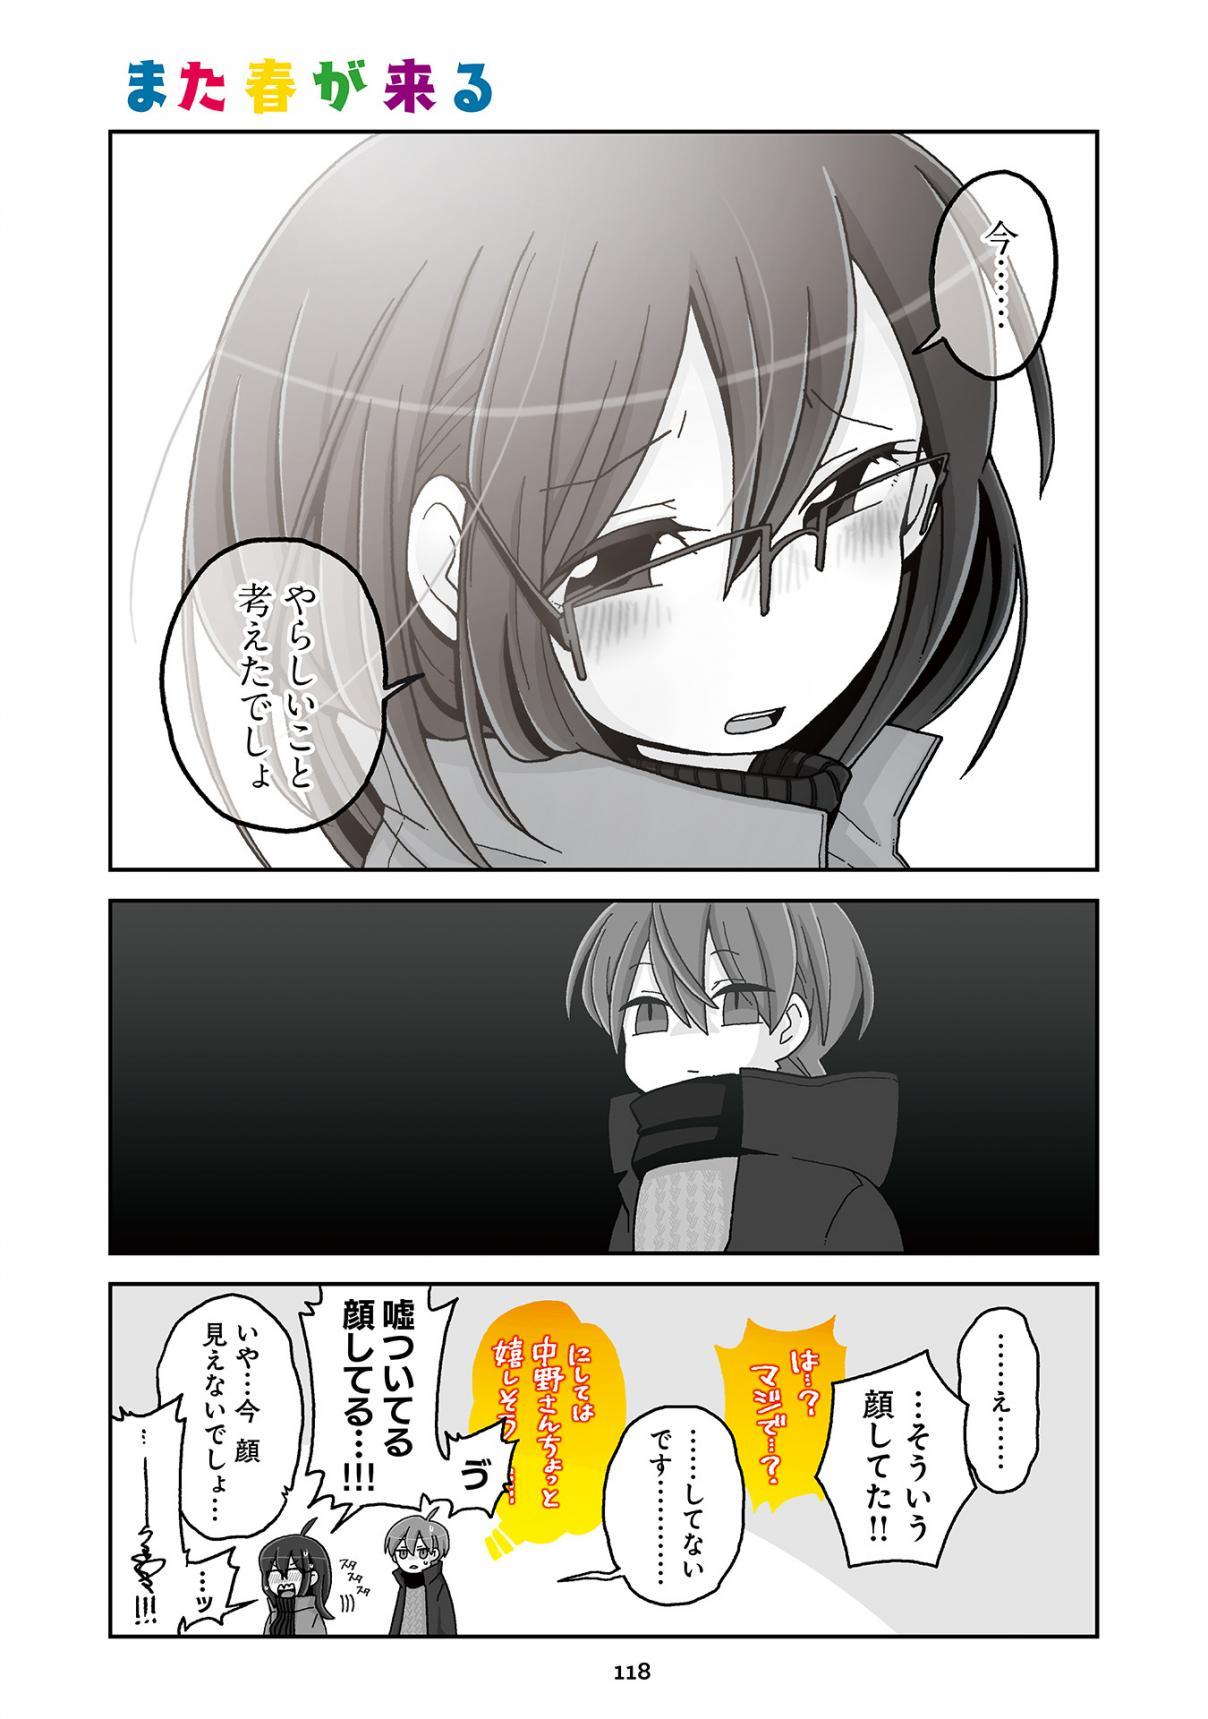 https://manga.mangadogs.com/comics/pic2/26/90/1346505/d689653dce7bb32245a5a9587ece86a2.jpg Page 1